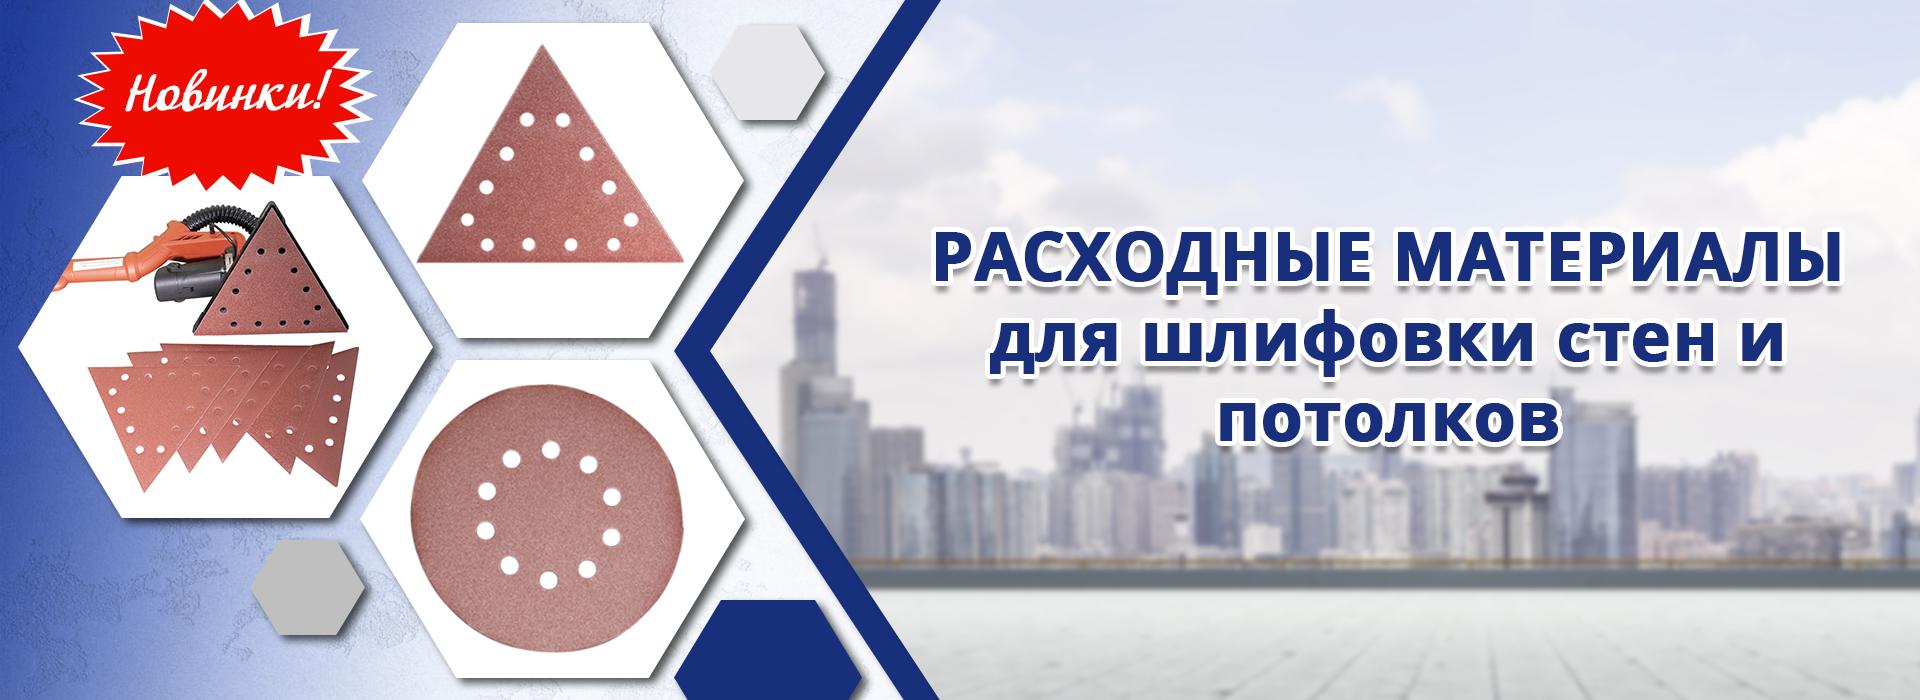 rashodniki_mart_2020